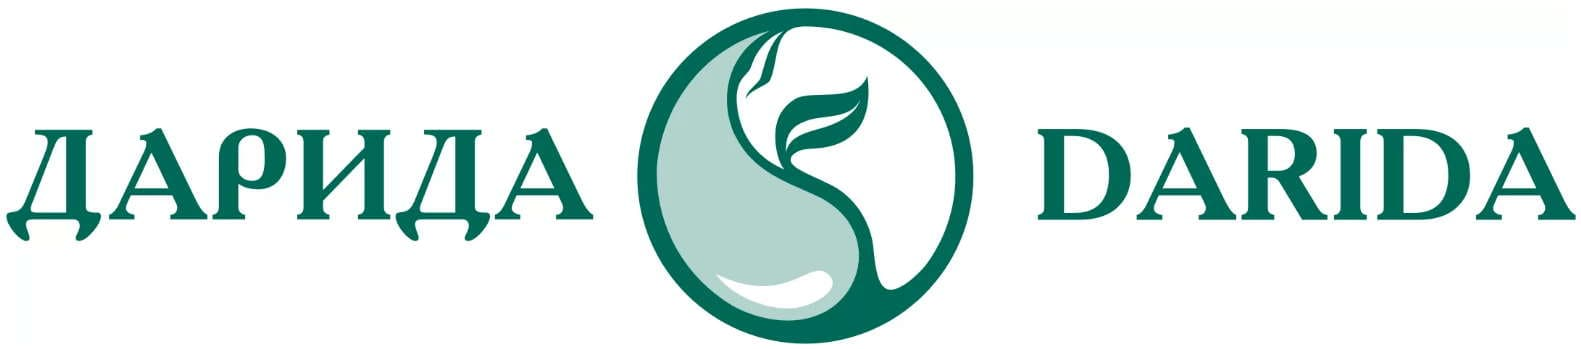 Дарида - товарный знак